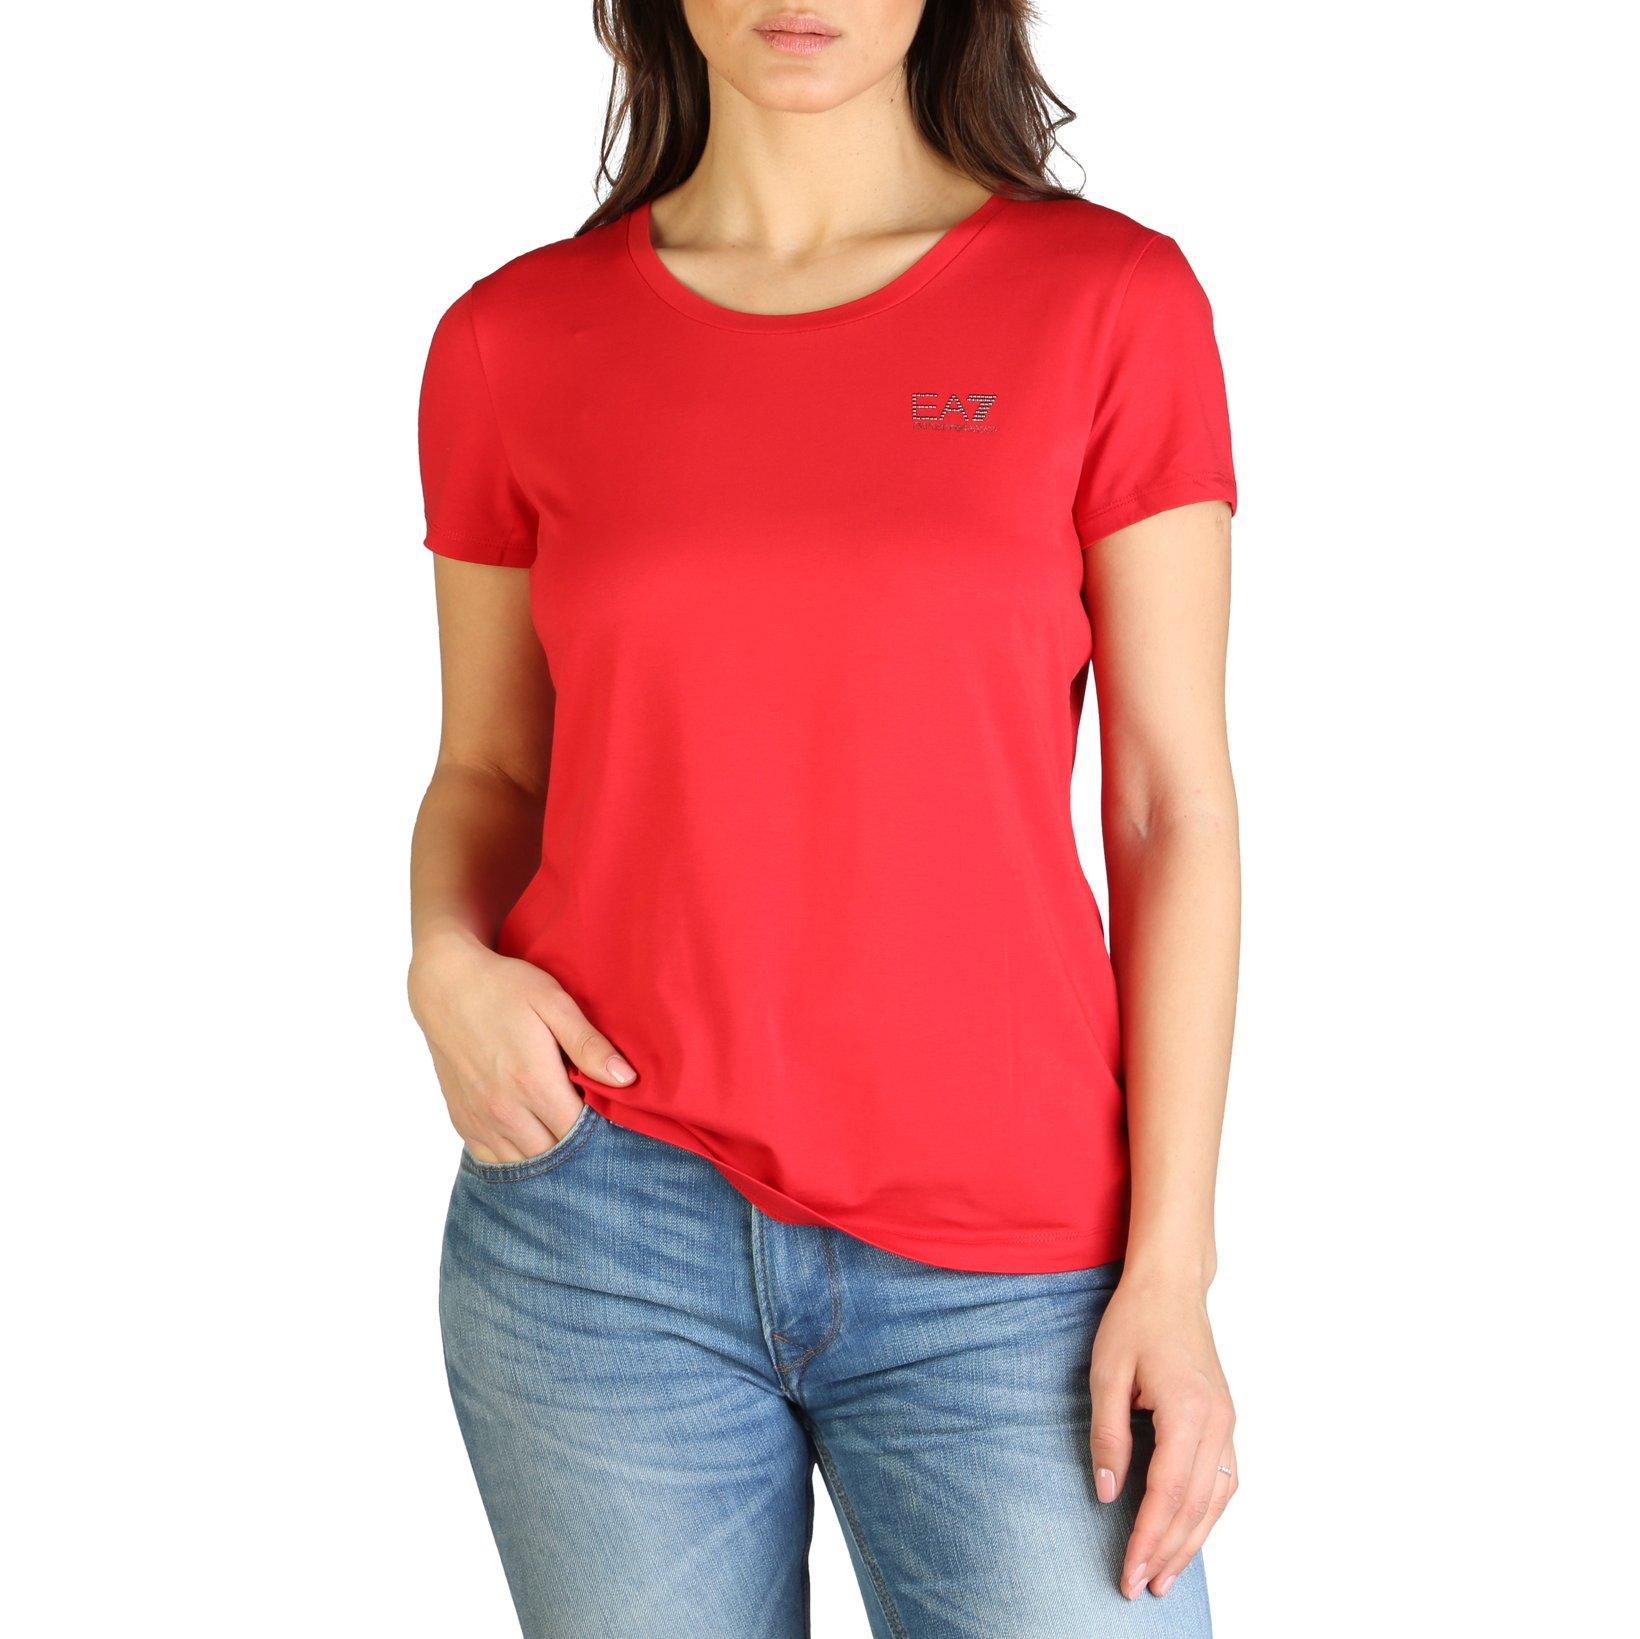 EA7 Women's T-Shirt Various Colours 7VTT01_TJ4FZ - red XL